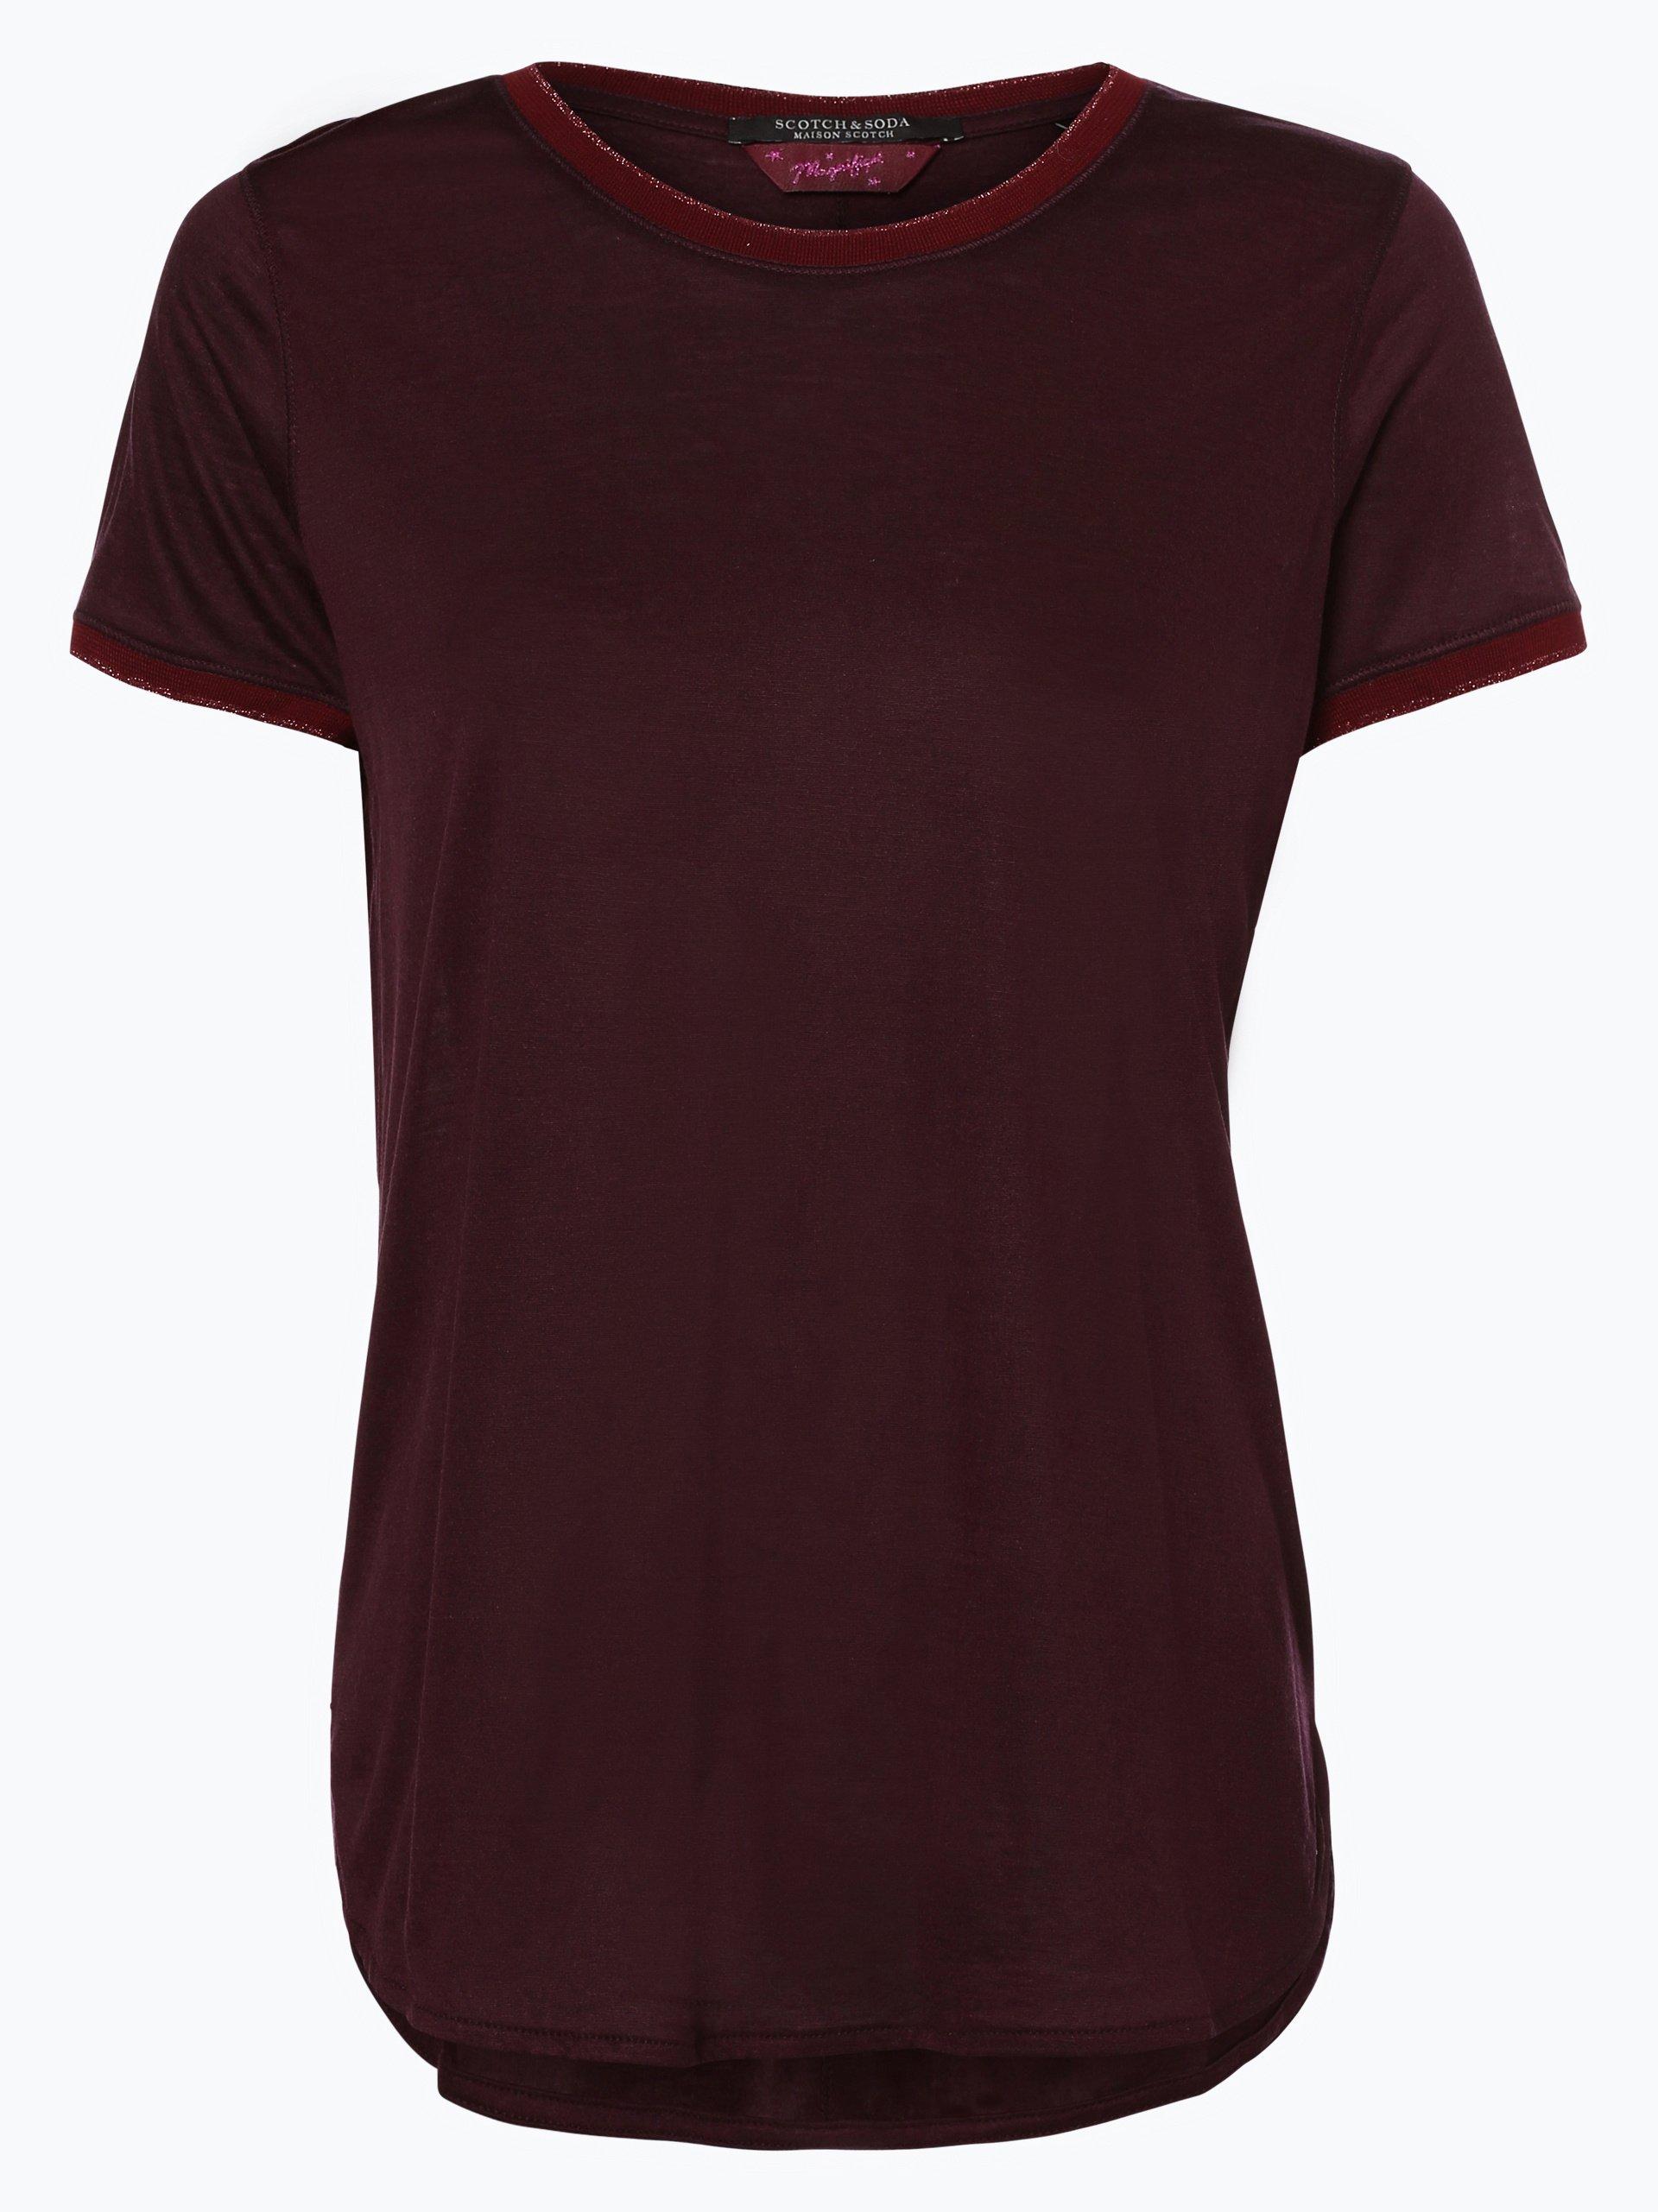 scotch soda damen t shirt bordeaux uni online kaufen. Black Bedroom Furniture Sets. Home Design Ideas